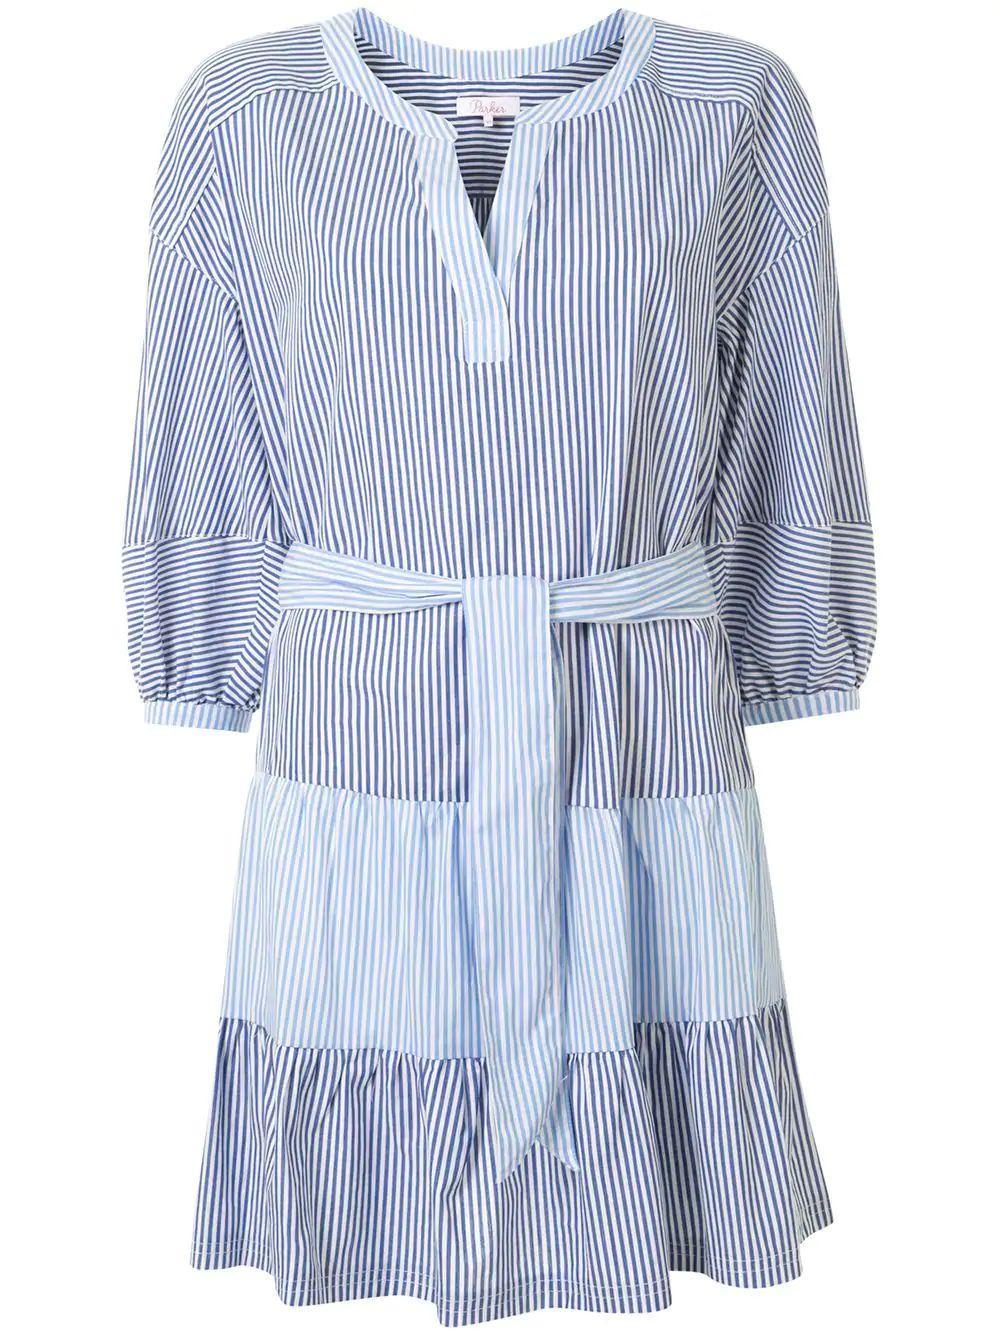 Jenna Combo Dress